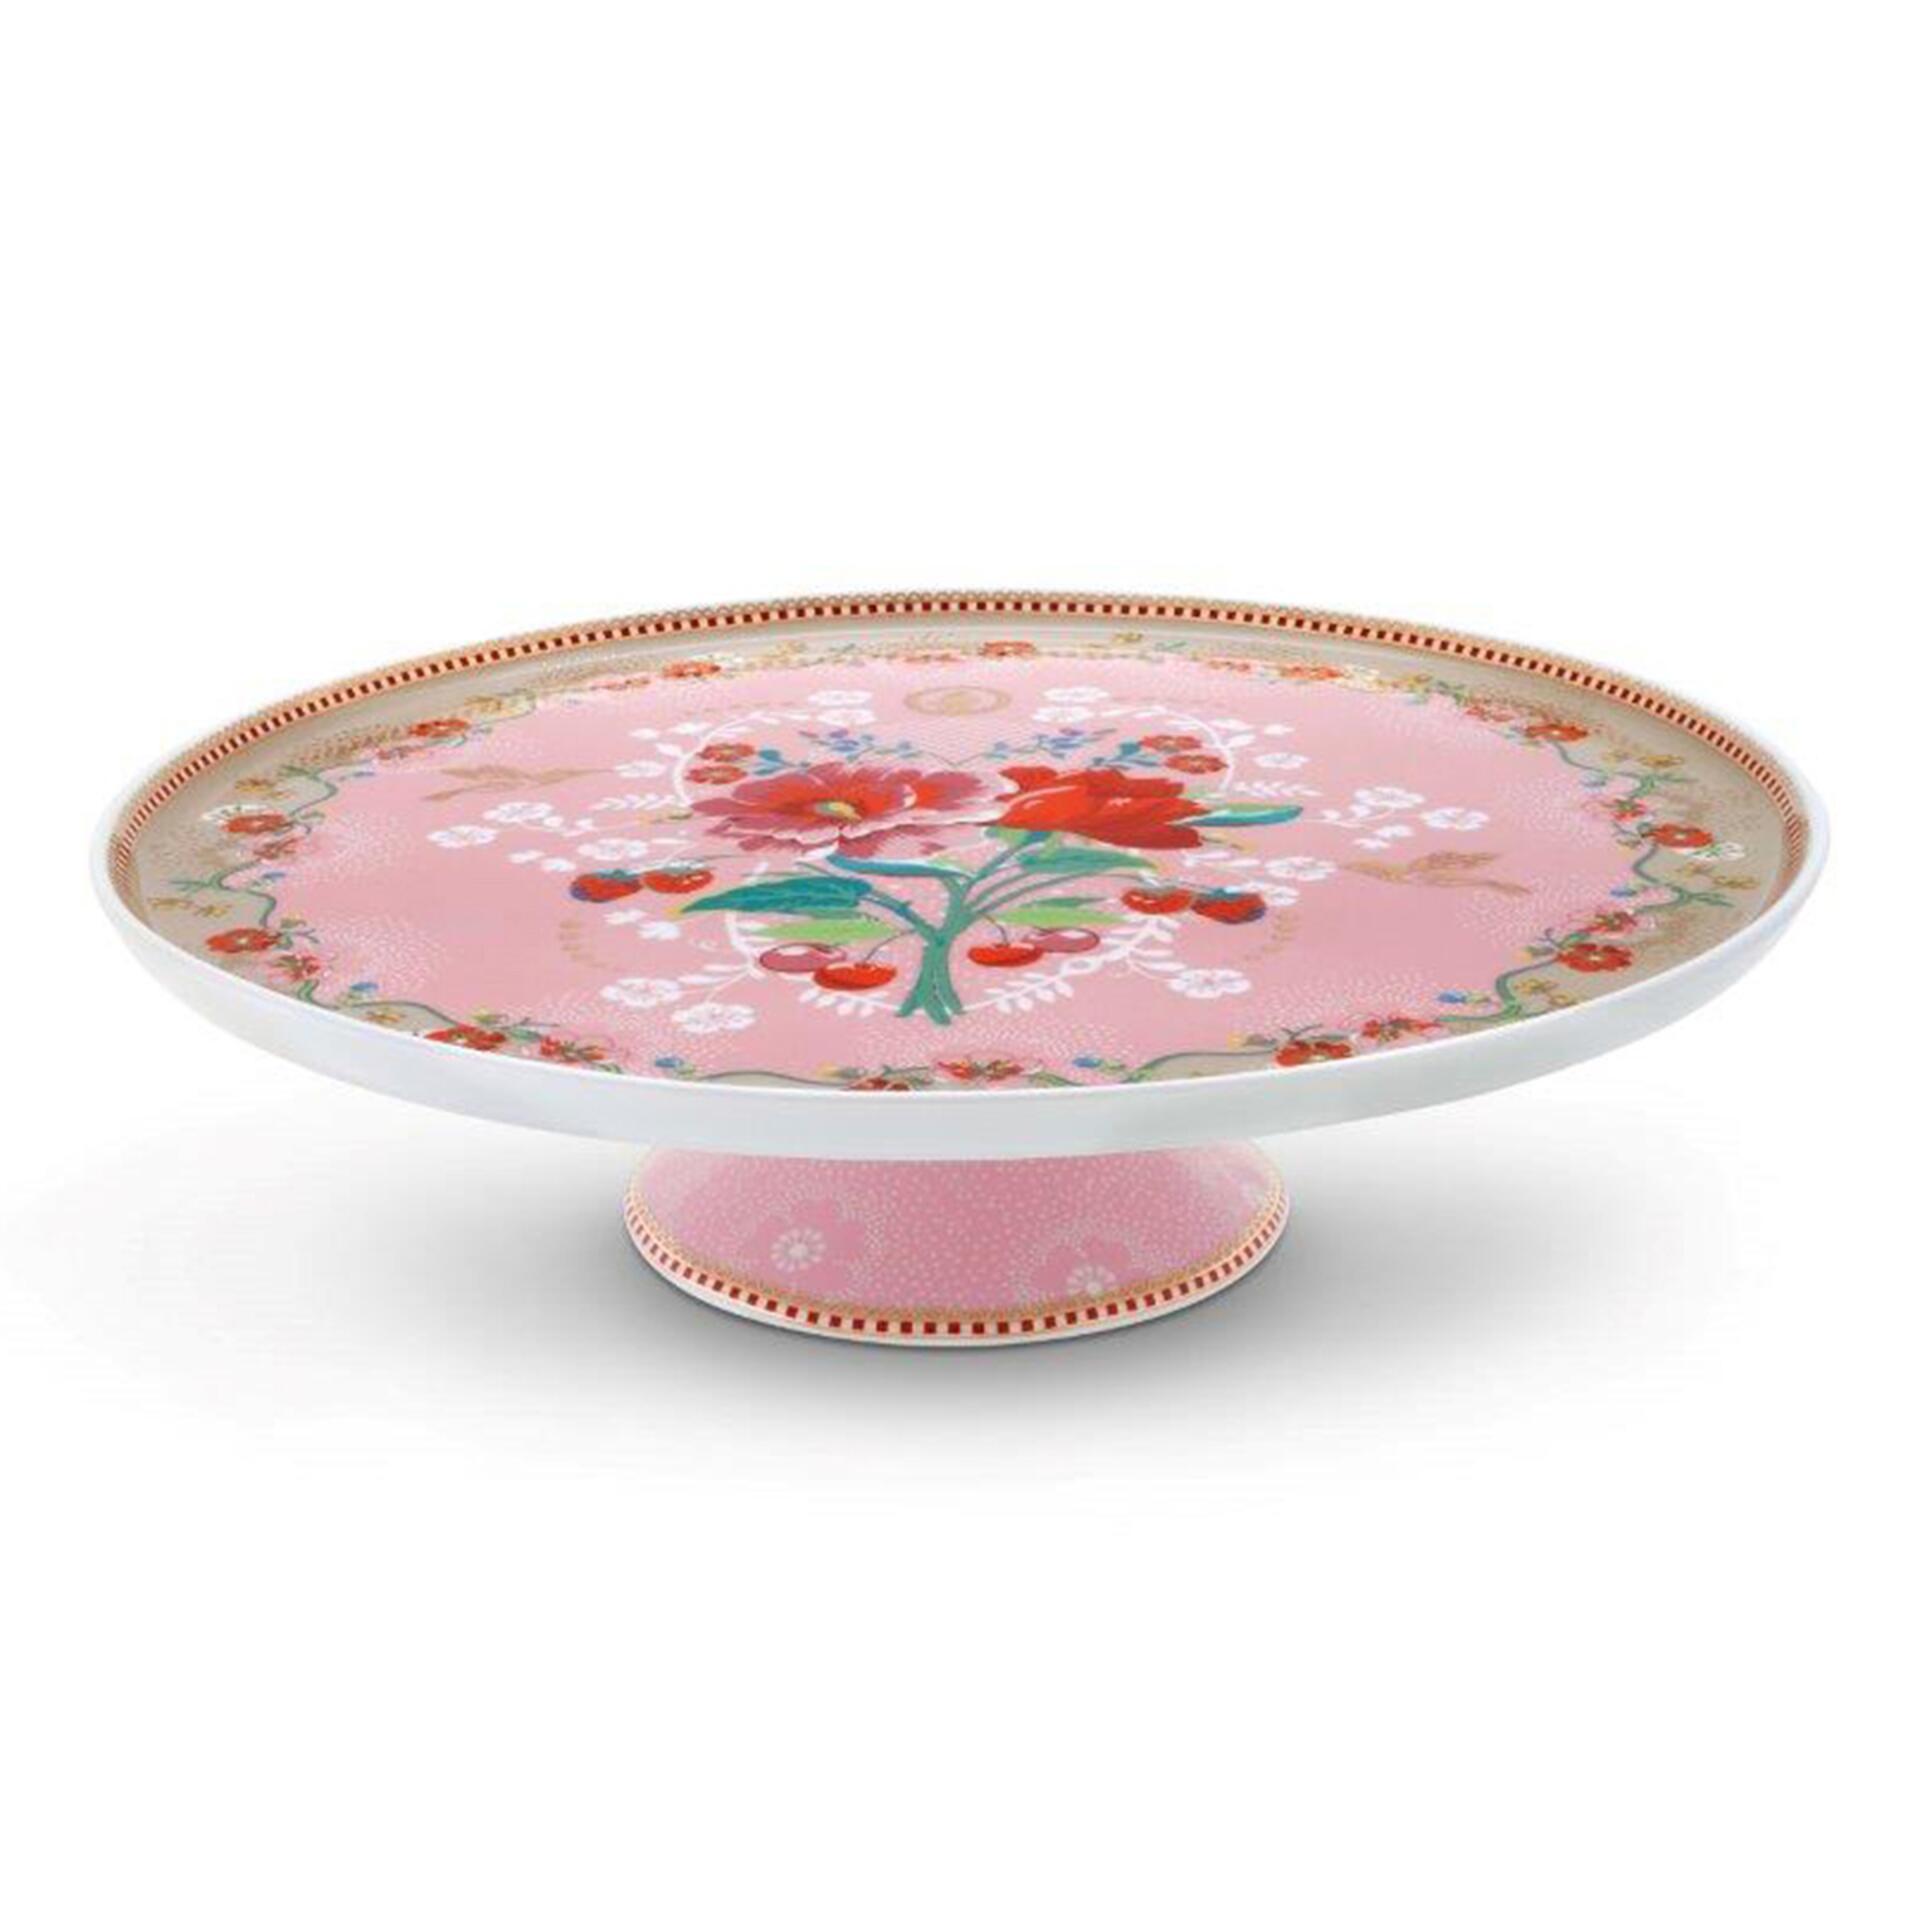 PiP Porzellan Tortenplatte Rose Pink